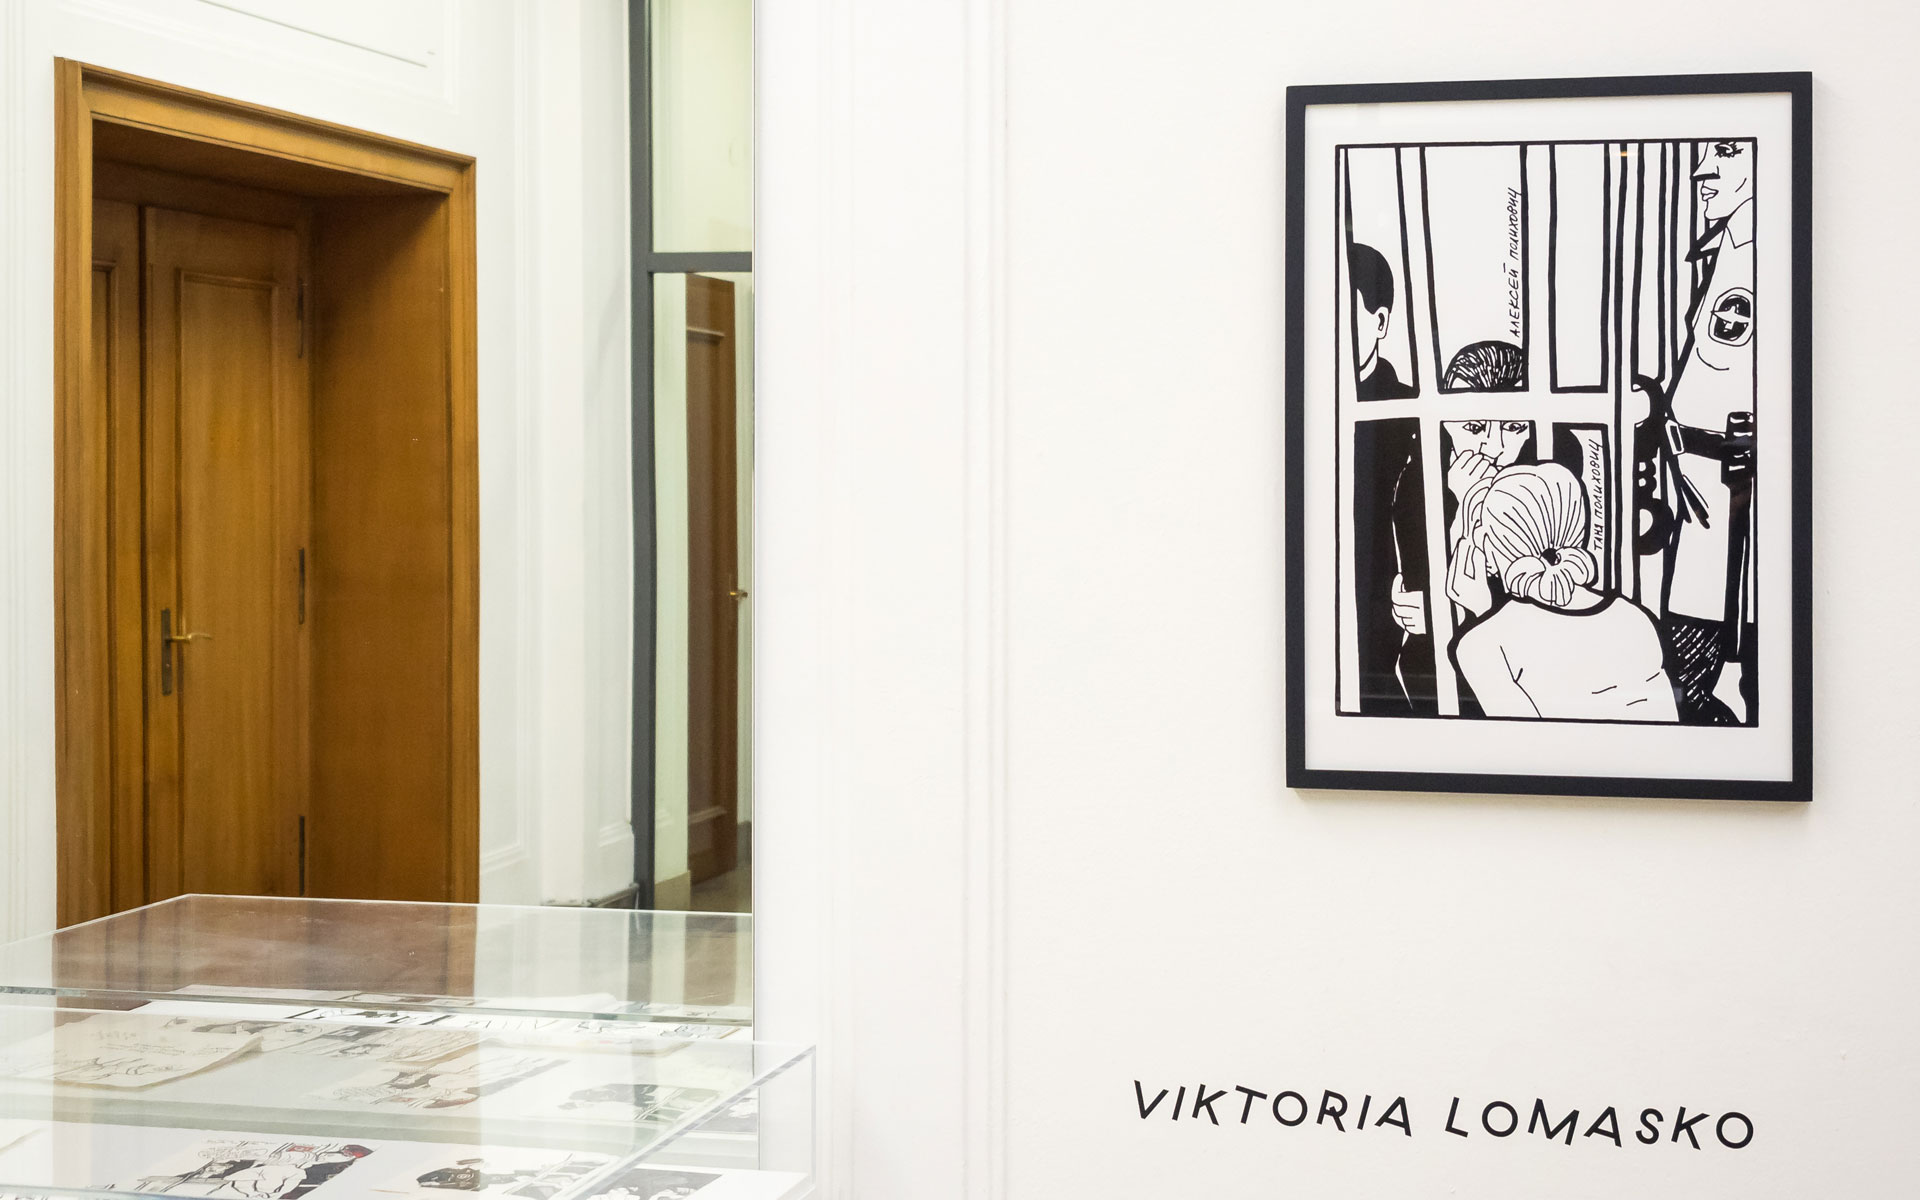 Viktoria Lomasko, Alexandar Zograf, Nikita Kadan, Andeel: Kunst im Protest: Vier Positionen, Freitag, 18.09.15                      -                          Freitag, 30.10.15 <br/>(c) Sebastian Wenzel